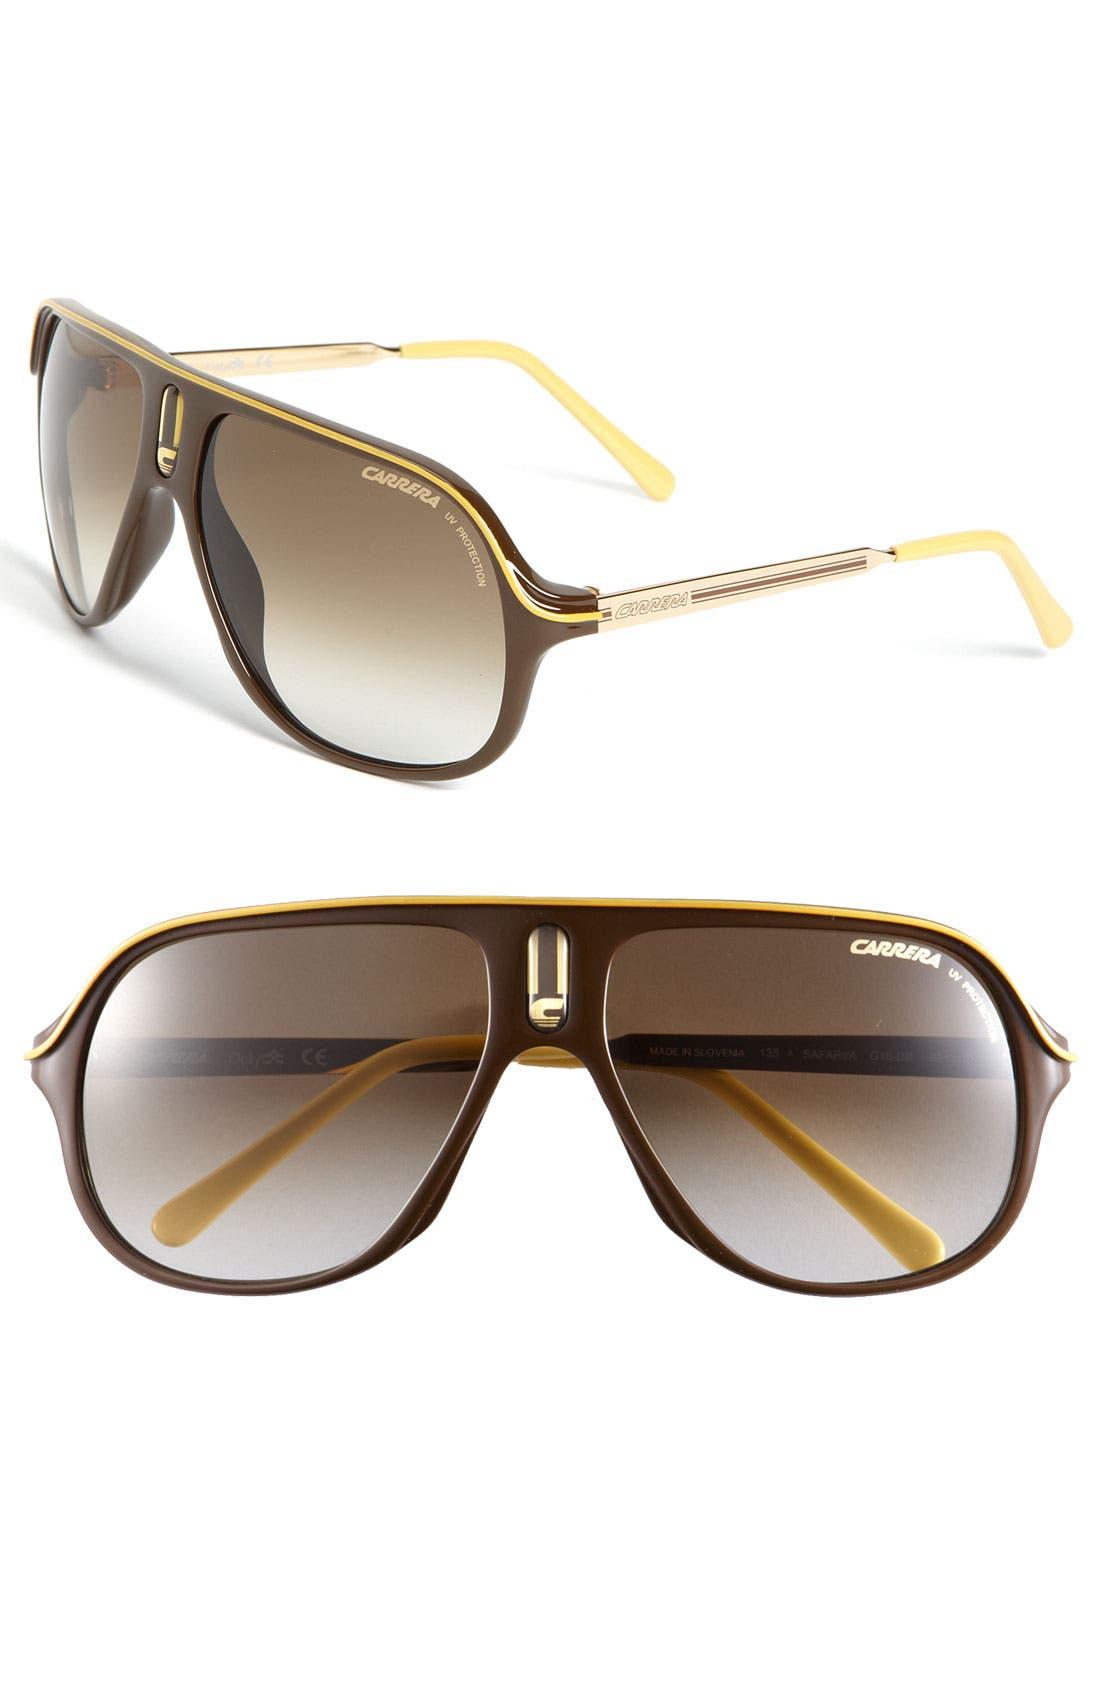 Alternate Image 1 Selected - Carrera Eyewear 'Safari' Polarized Aviator Sunglasses